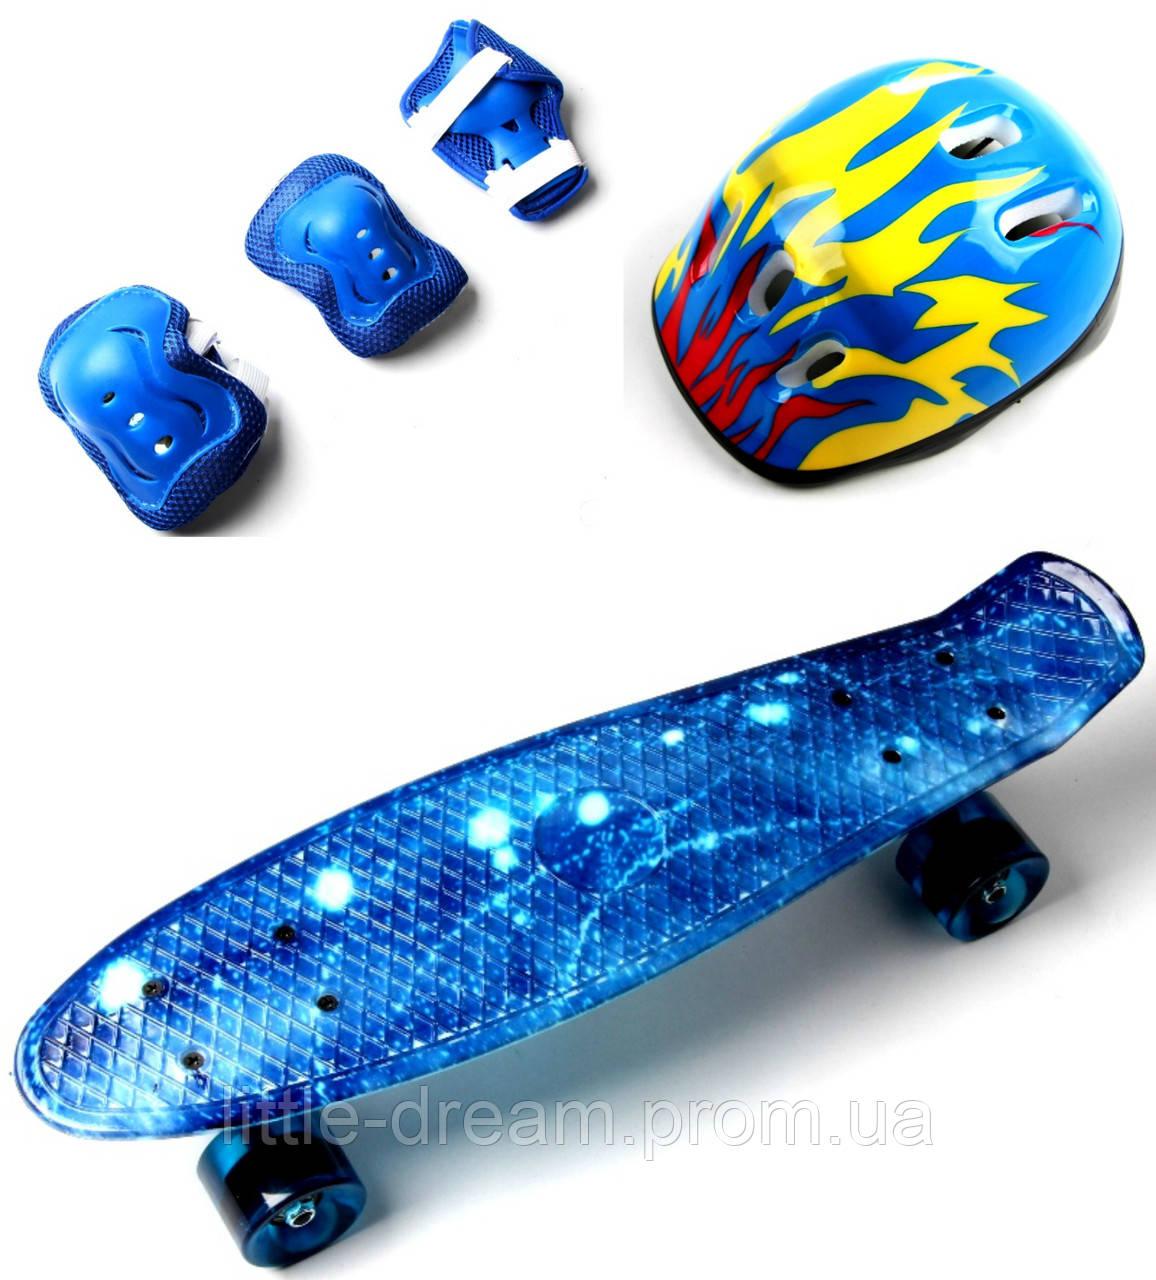 Пенниборд Penny Board. Галактика.+защита+шлем. Светящиеся колеса.